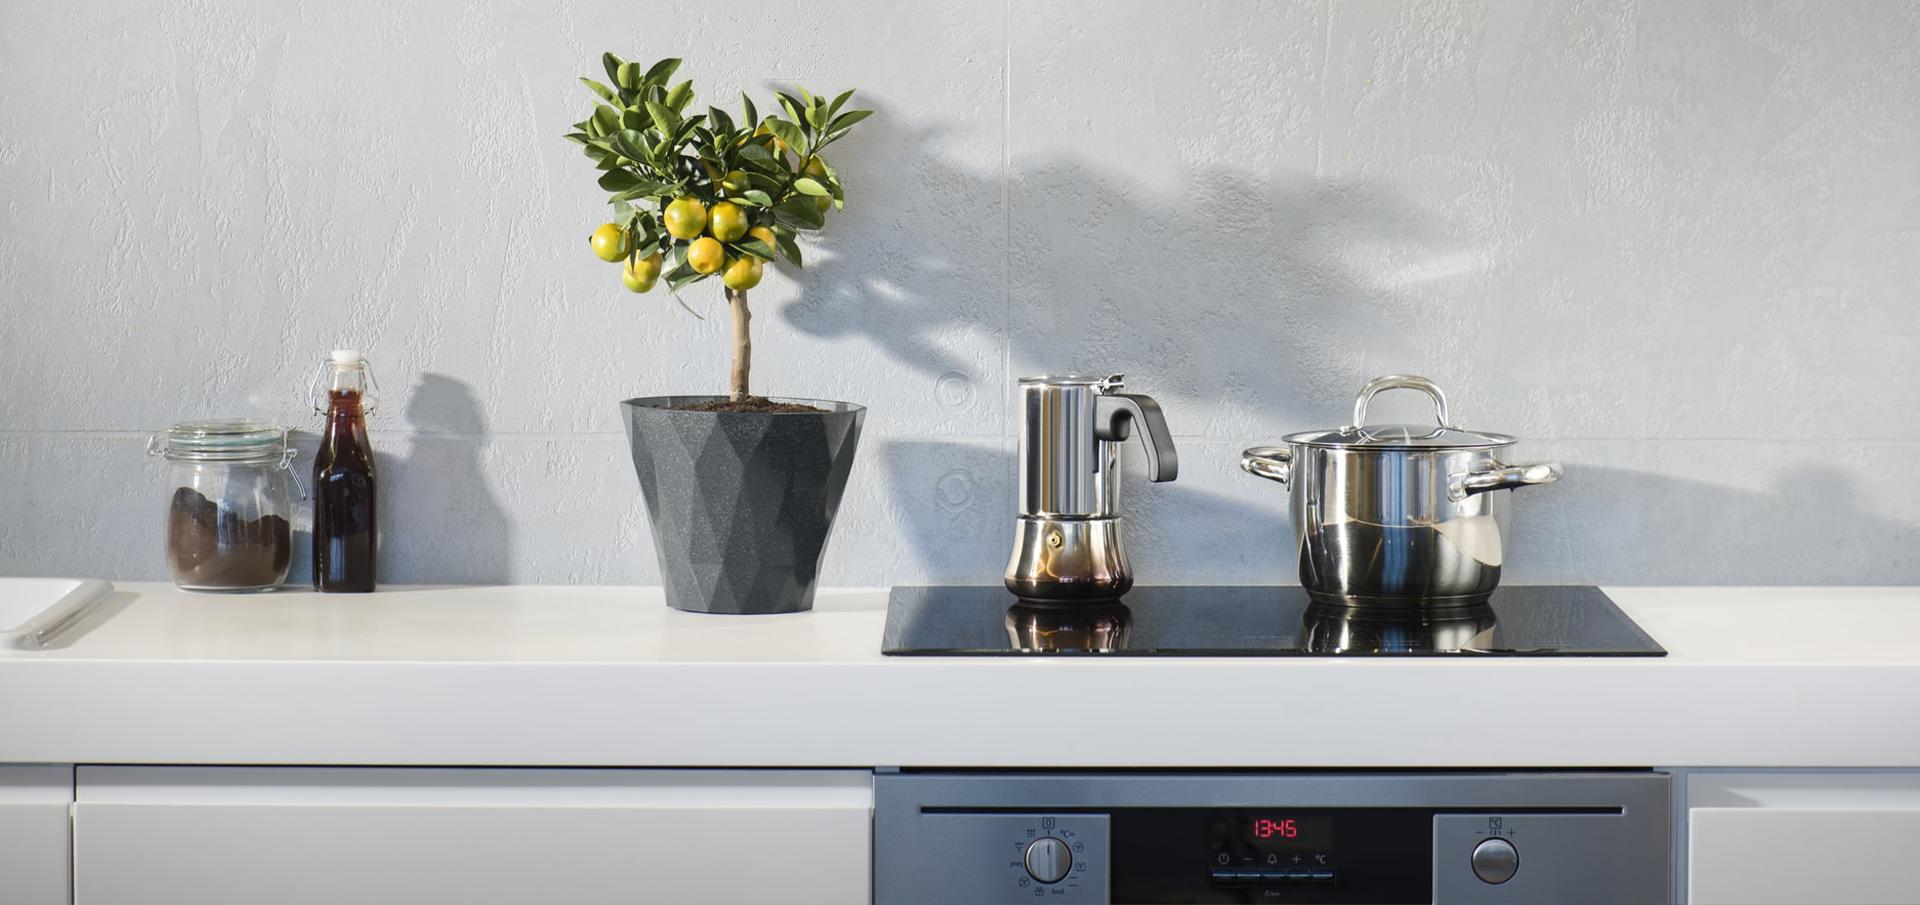 Cucine funzionale e di design